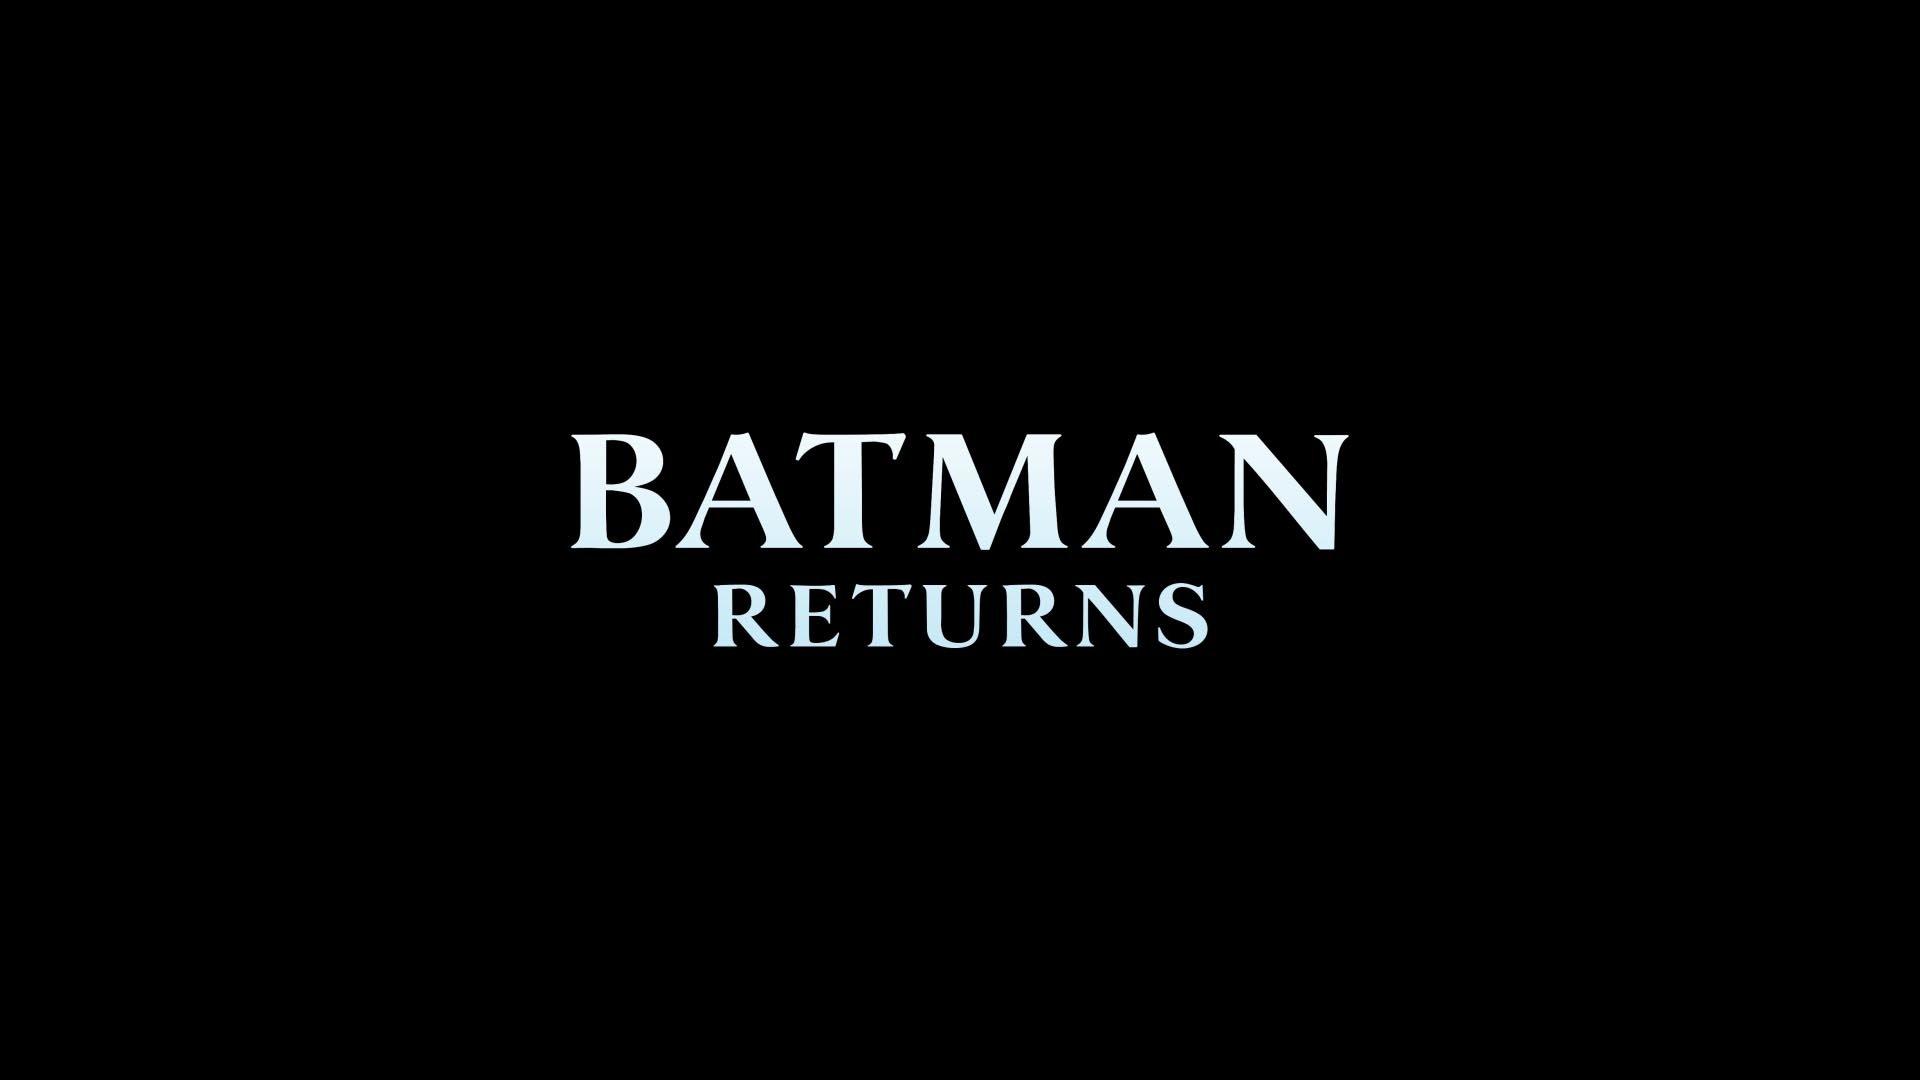 batman returns full movie videobash